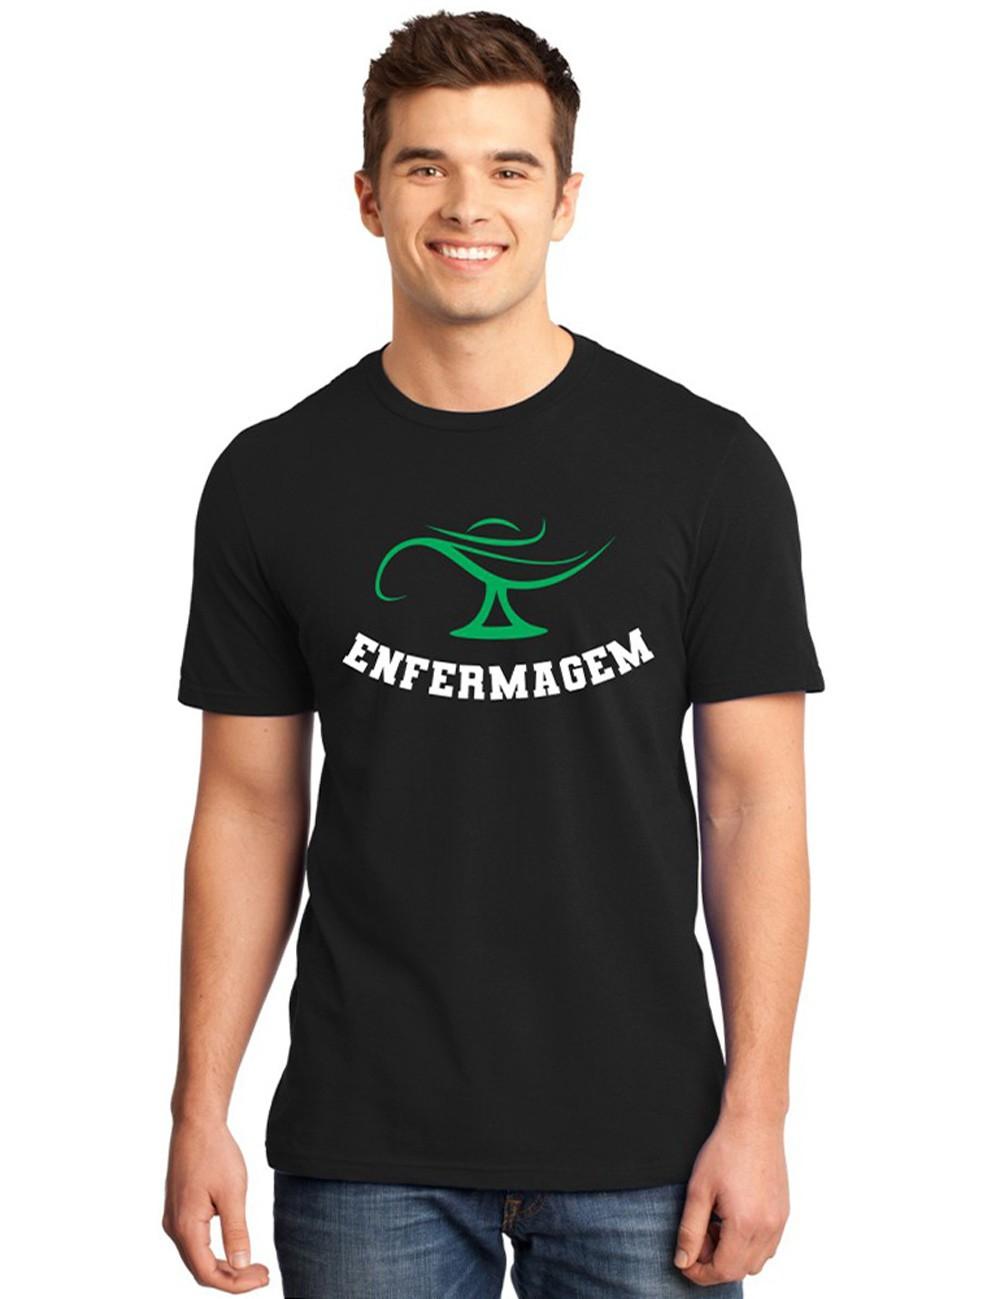 Camiseta Masculina Universitária Faculdade Enfermagem